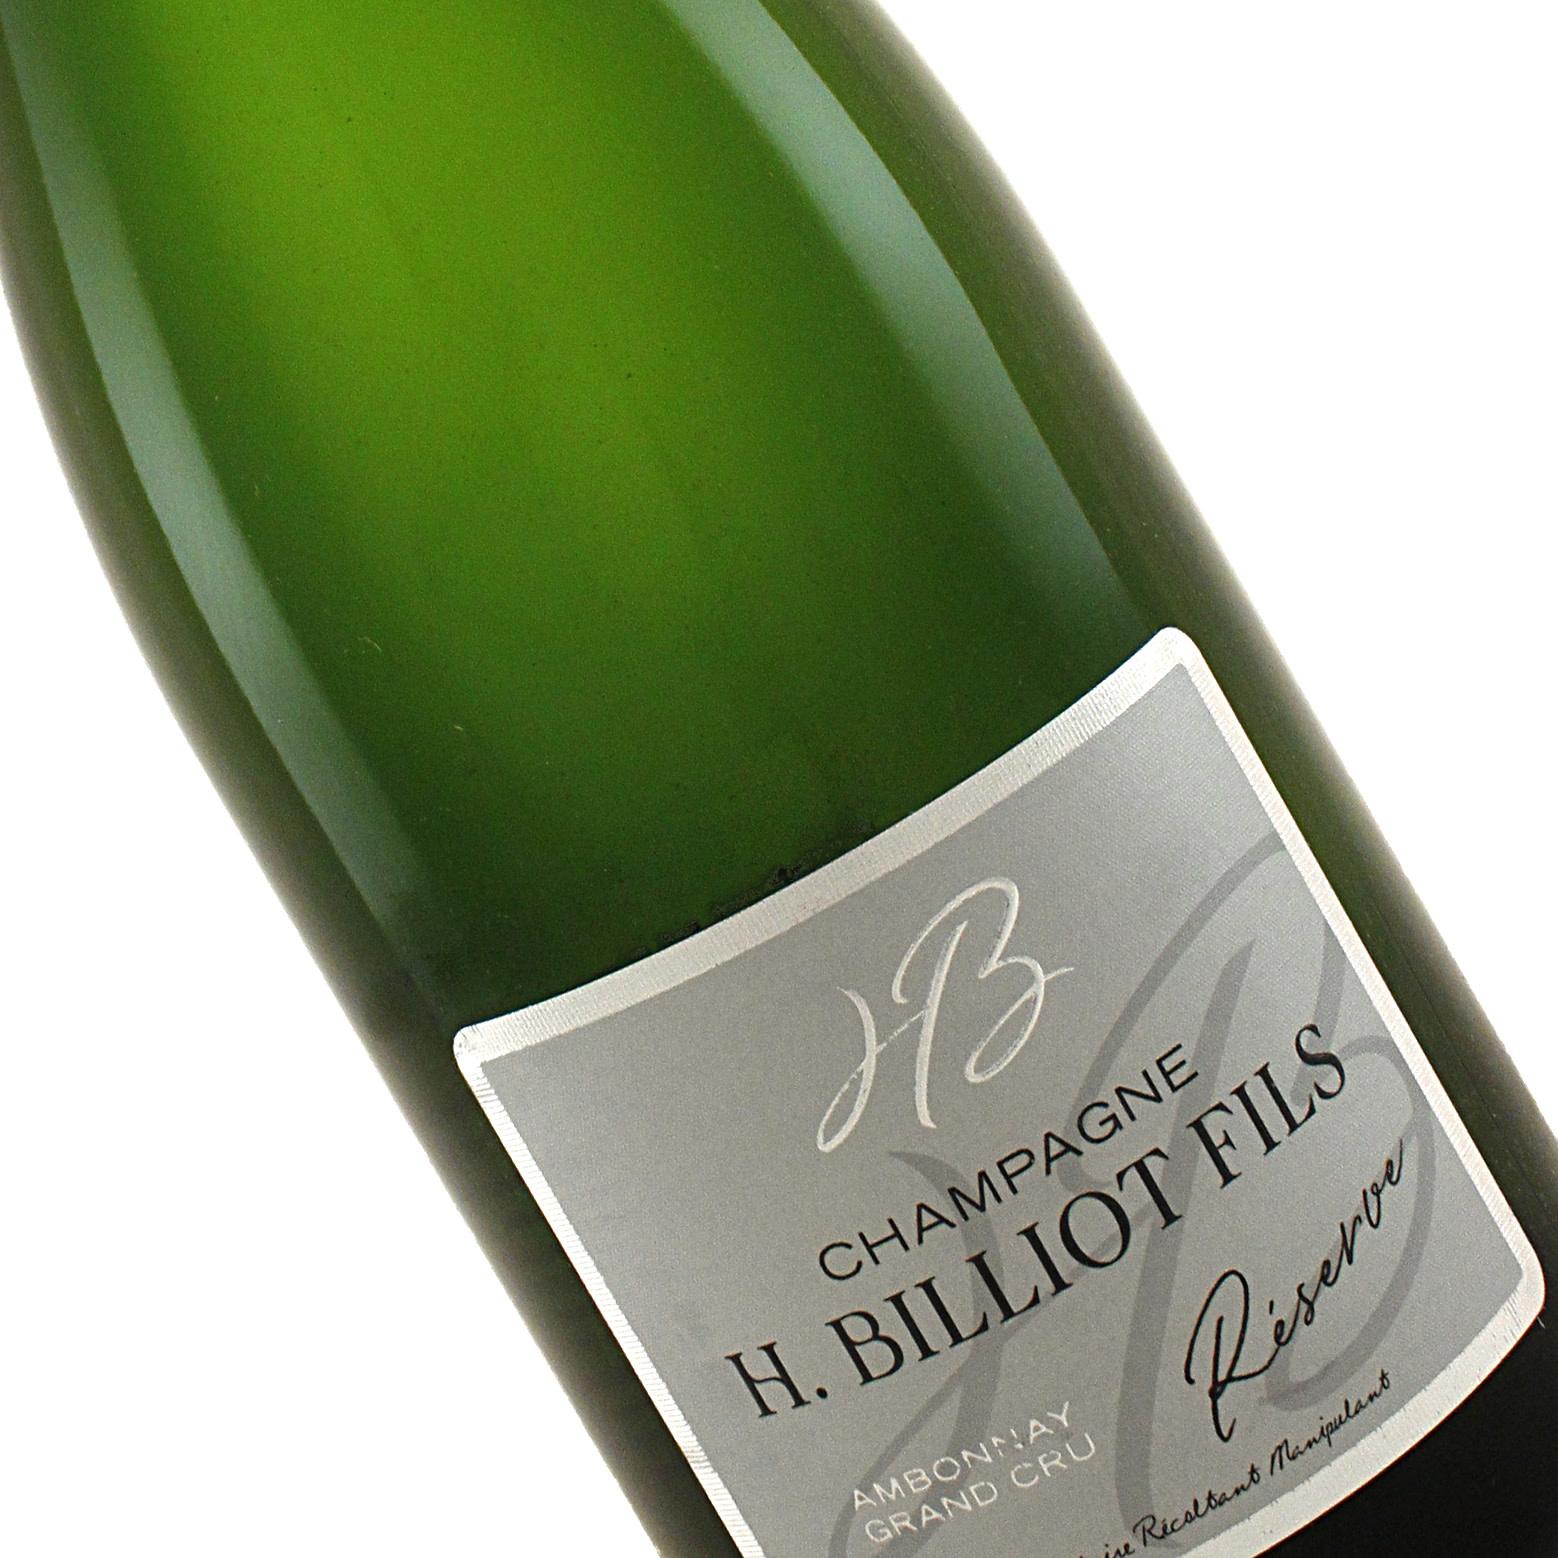 H. Billiot Fils N.V. Brut Reserve Grand Cru Champagne, Ambonnay